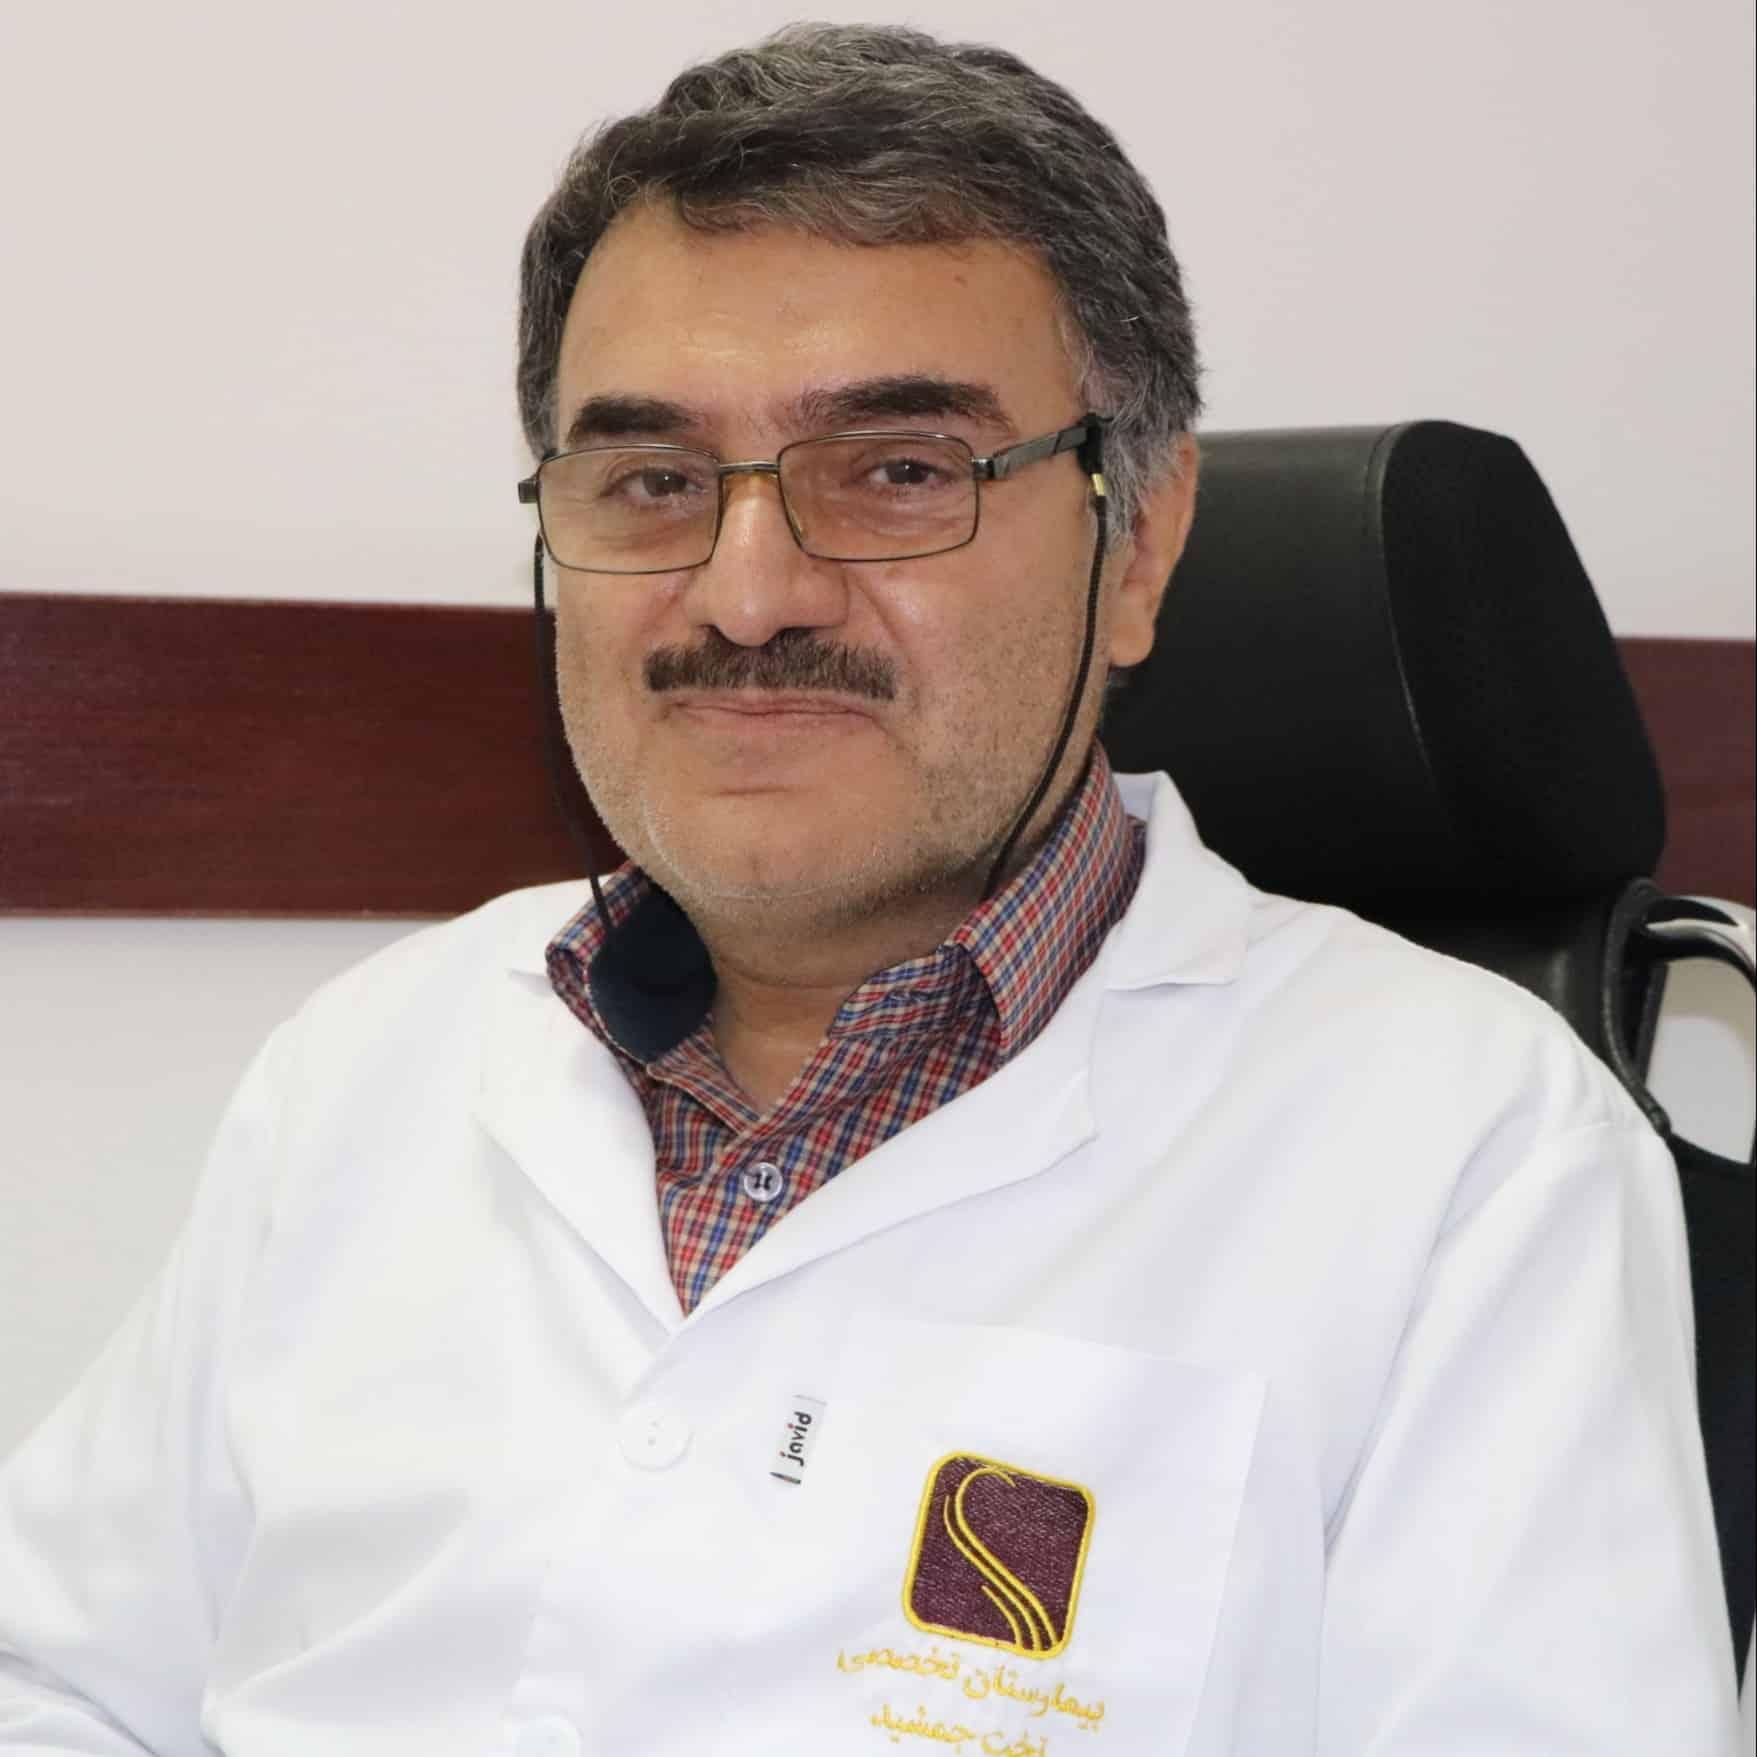 دکتر سعید صادقیان